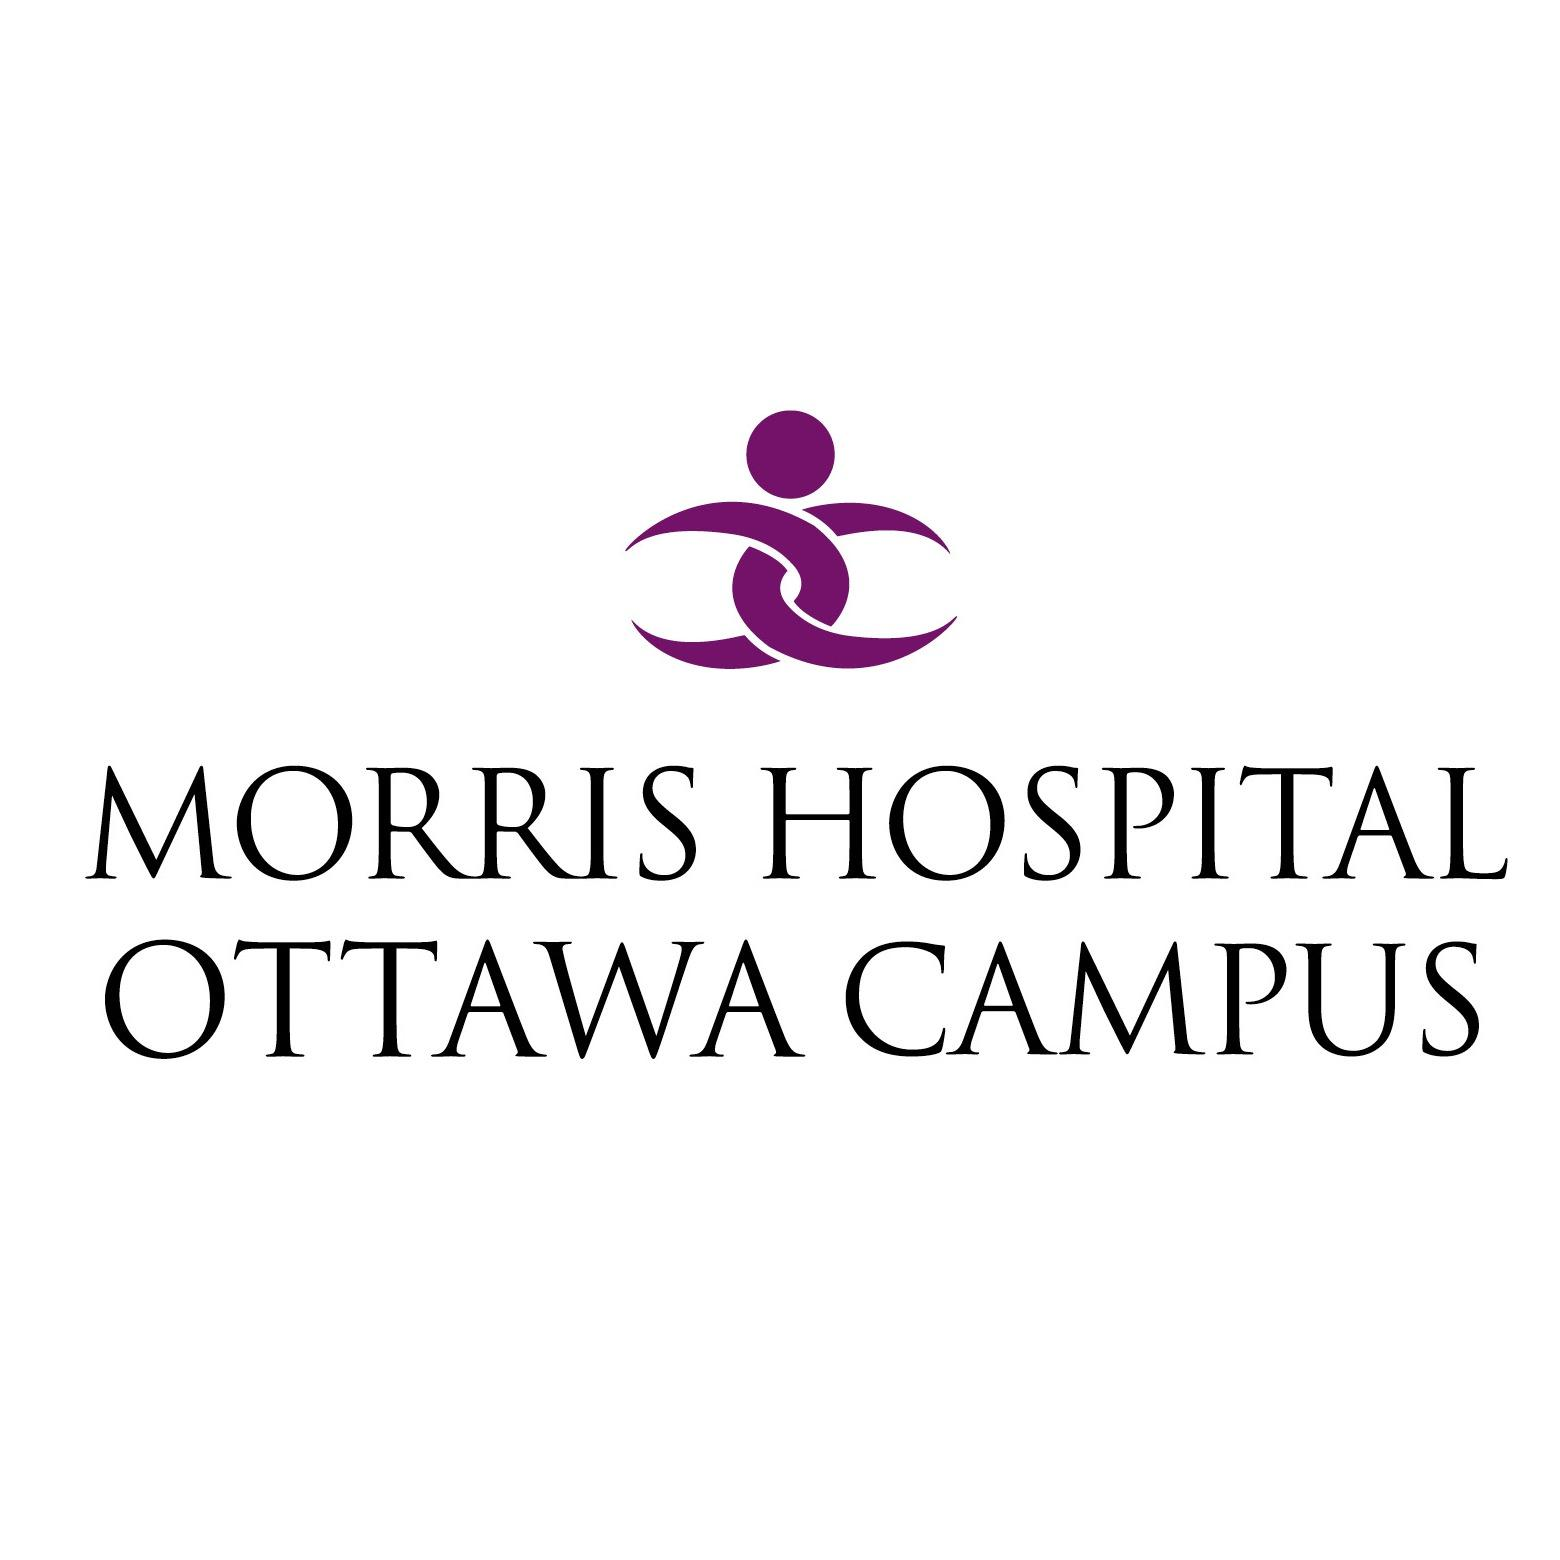 Morris Hospital Ottawa Campus image 4